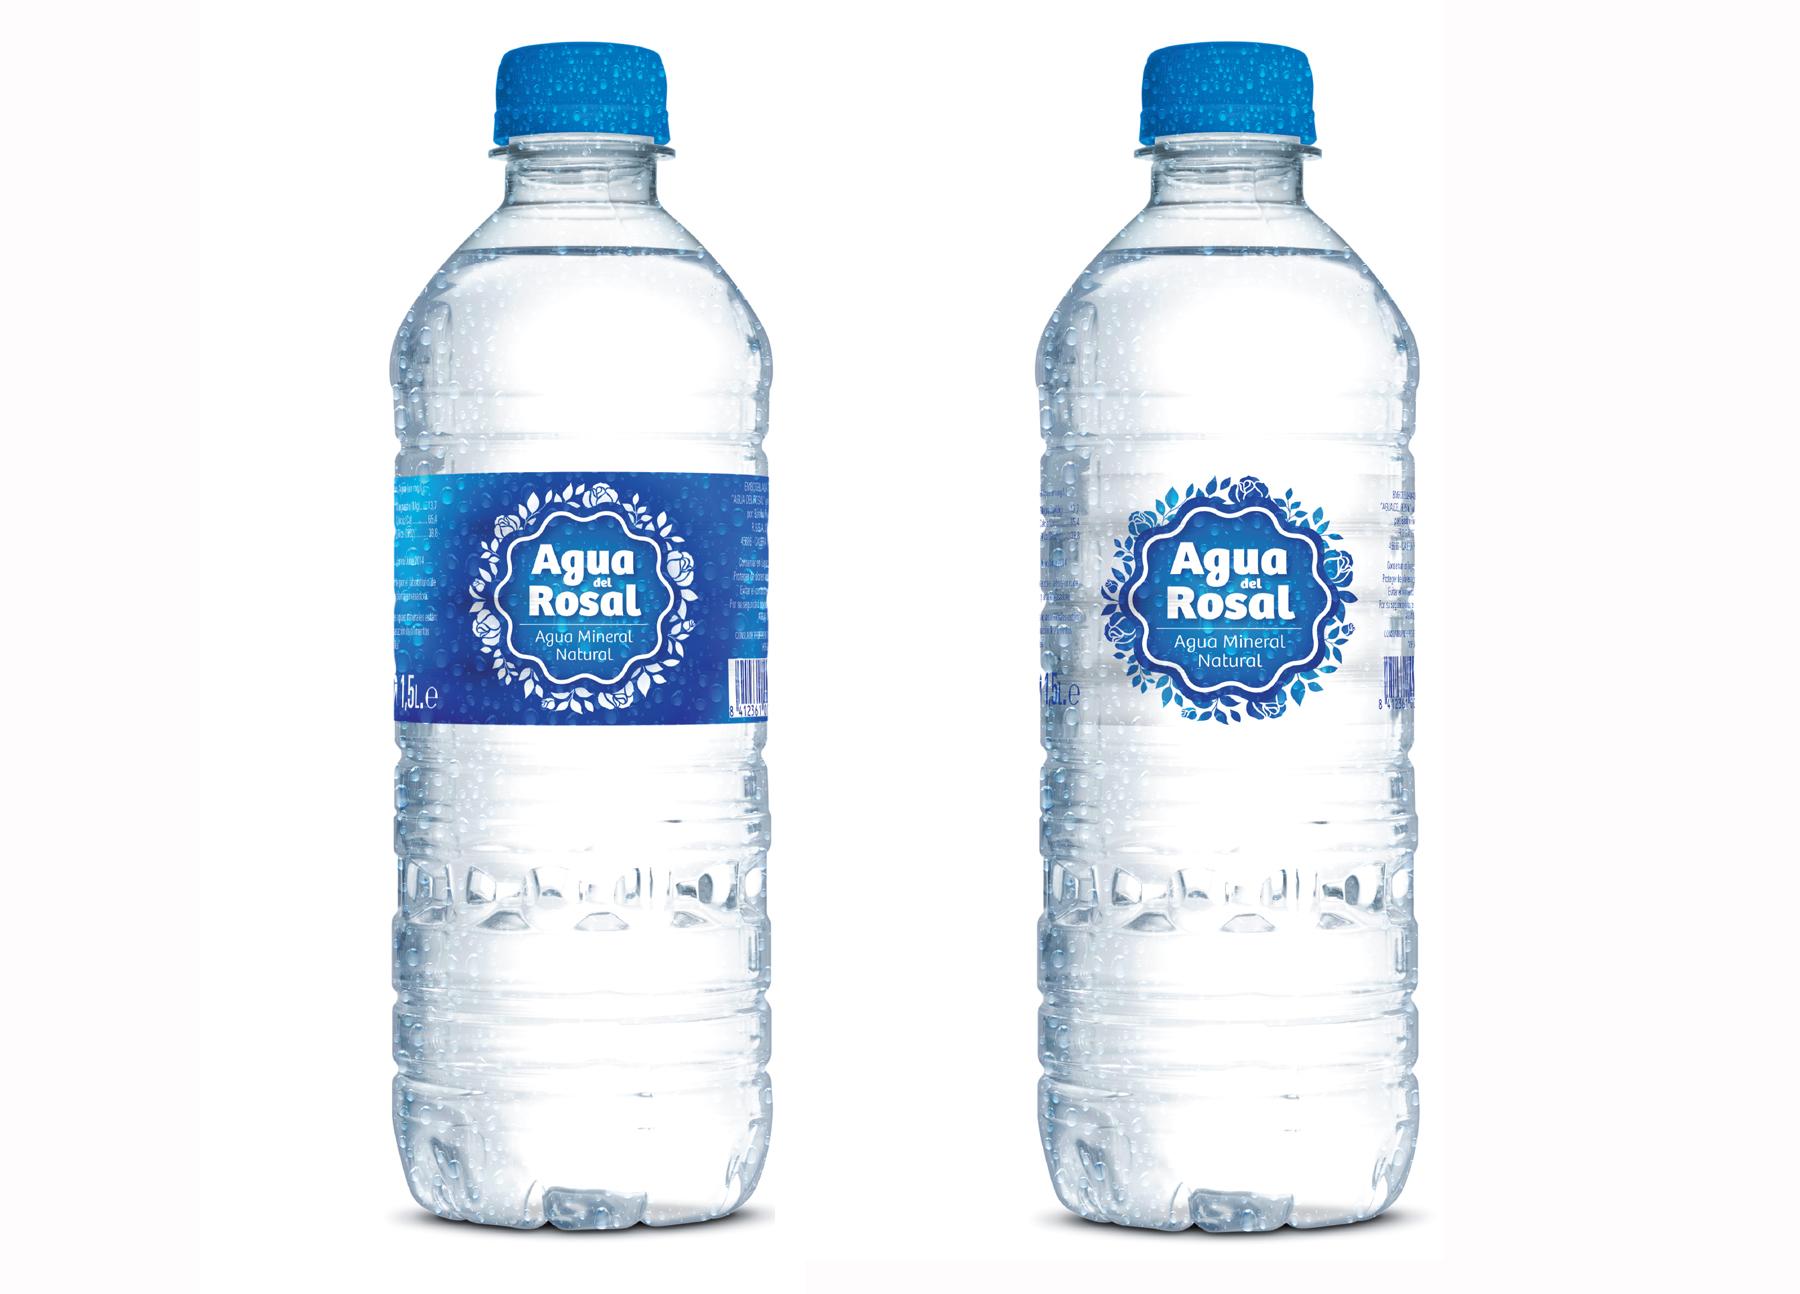 03 Agua del Rosal. Branding